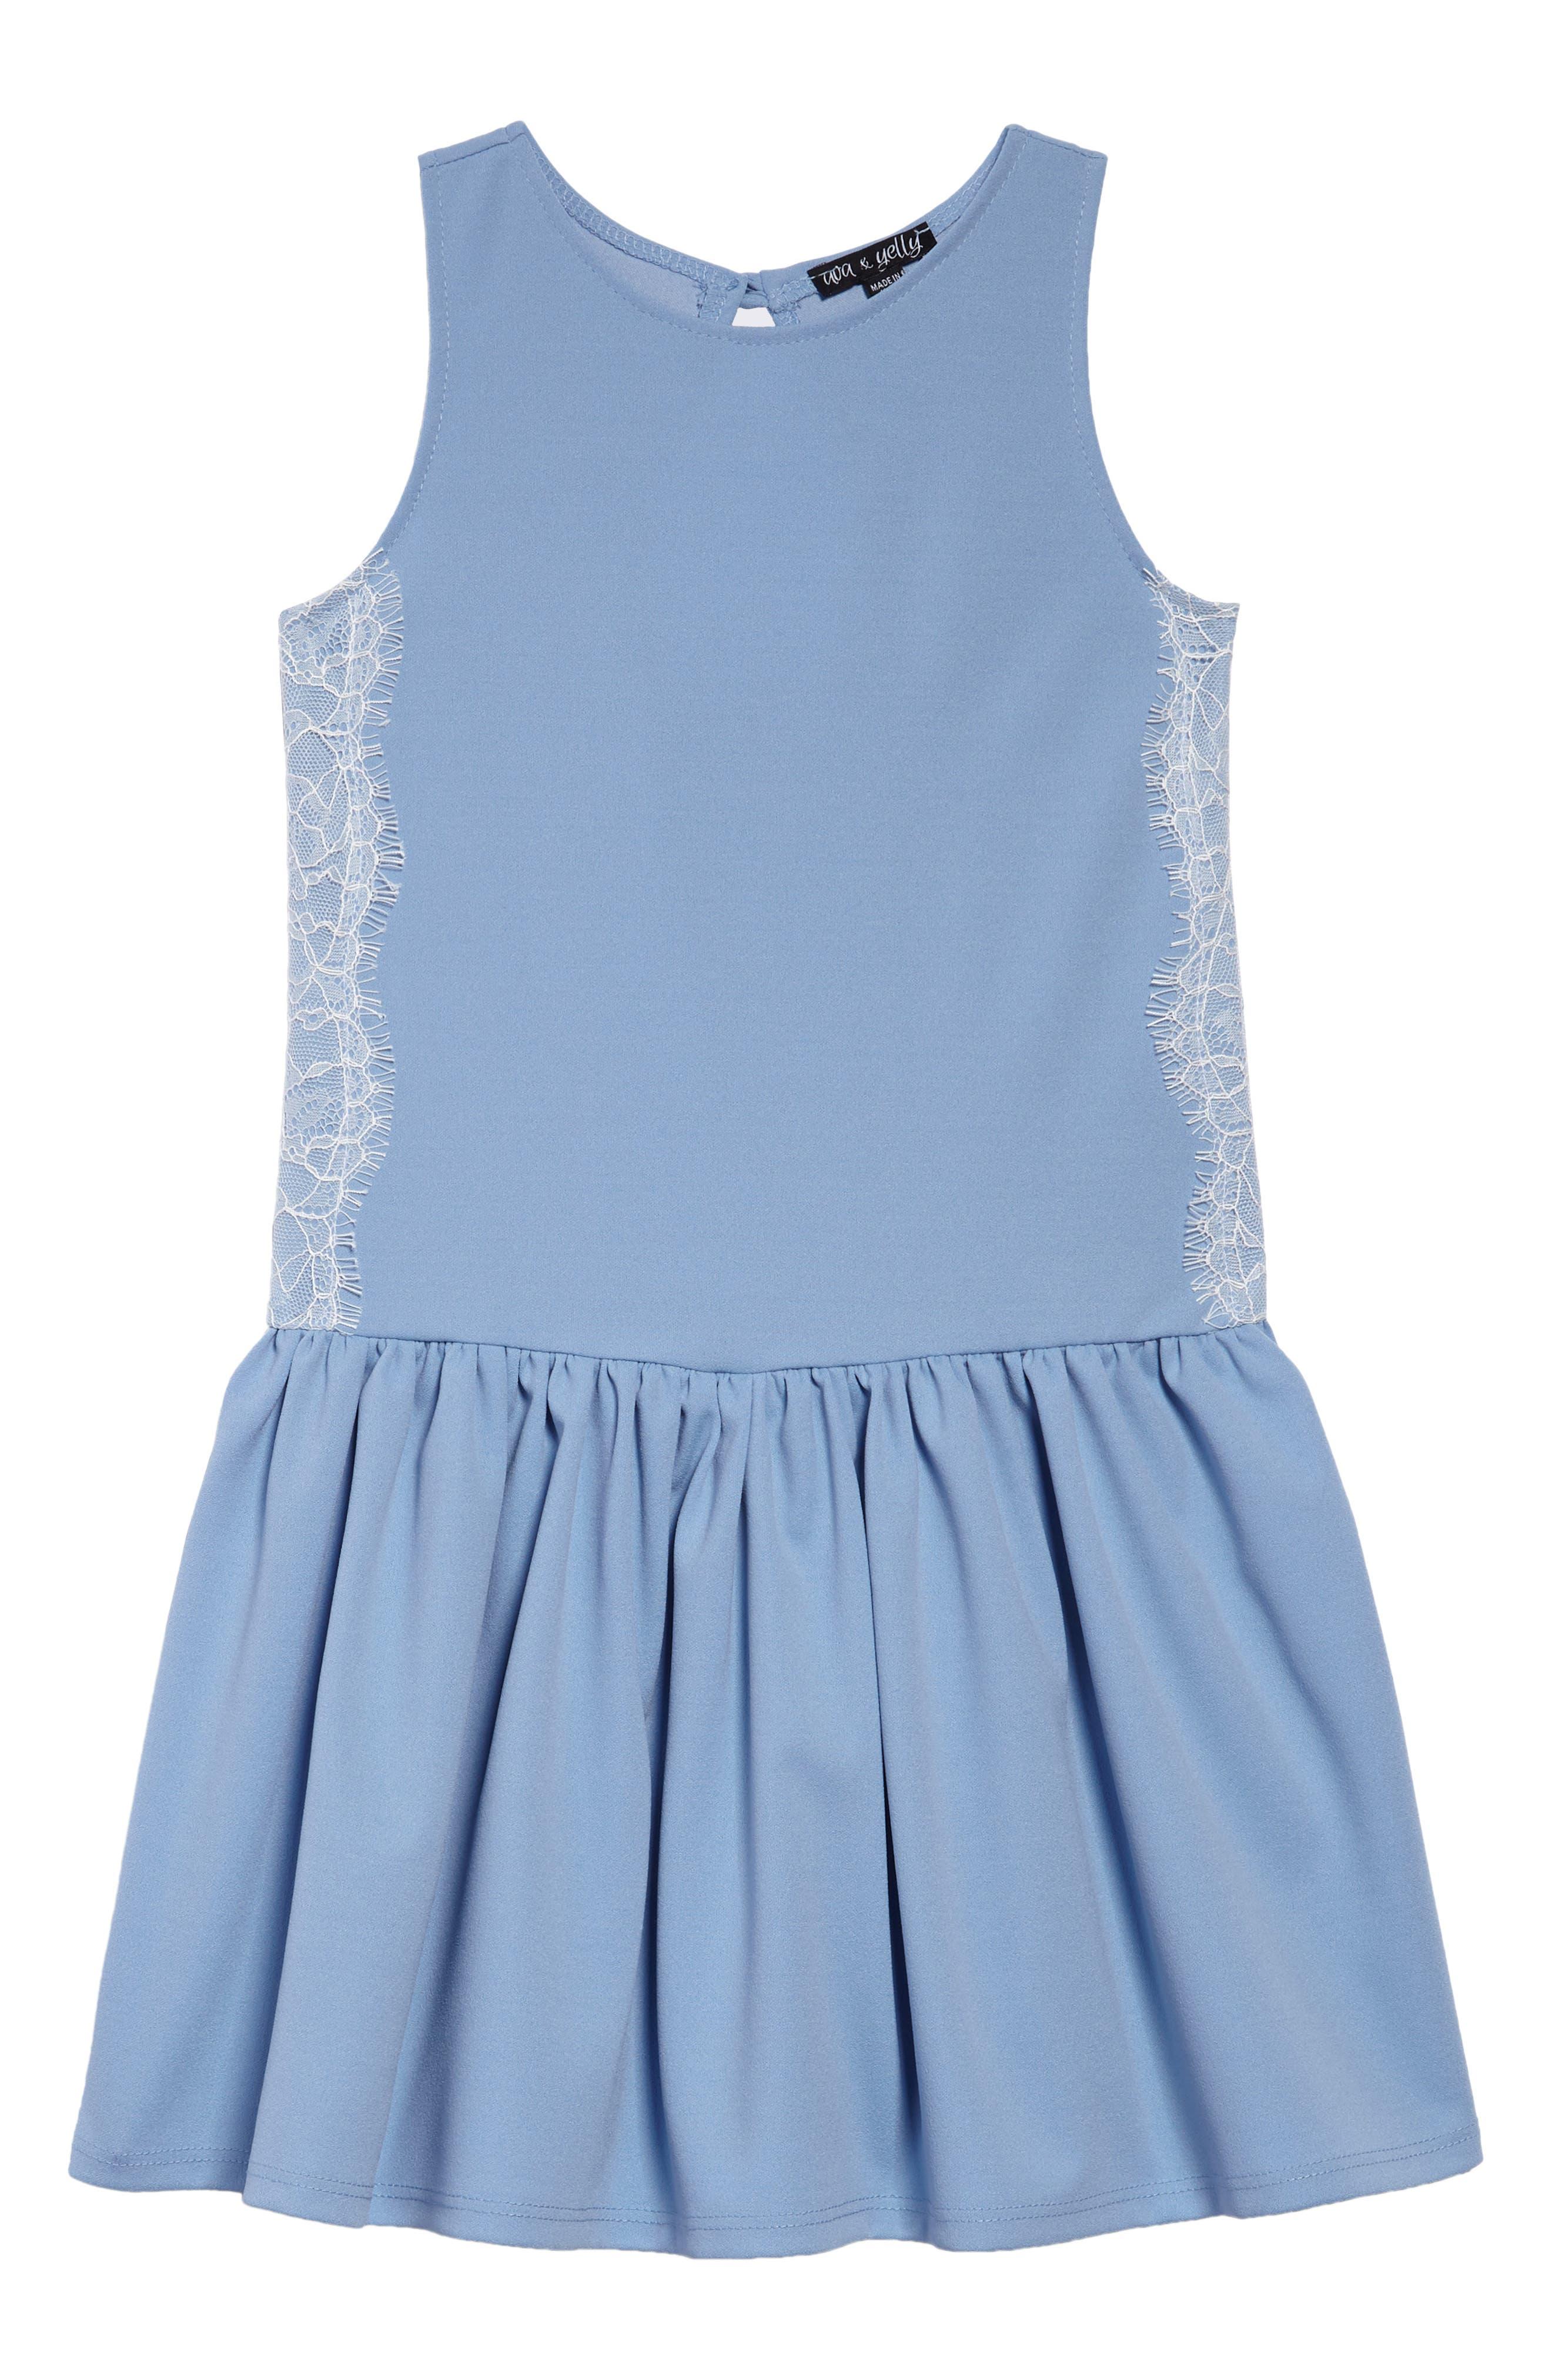 Drop Waist Dress,                             Main thumbnail 1, color,                             400